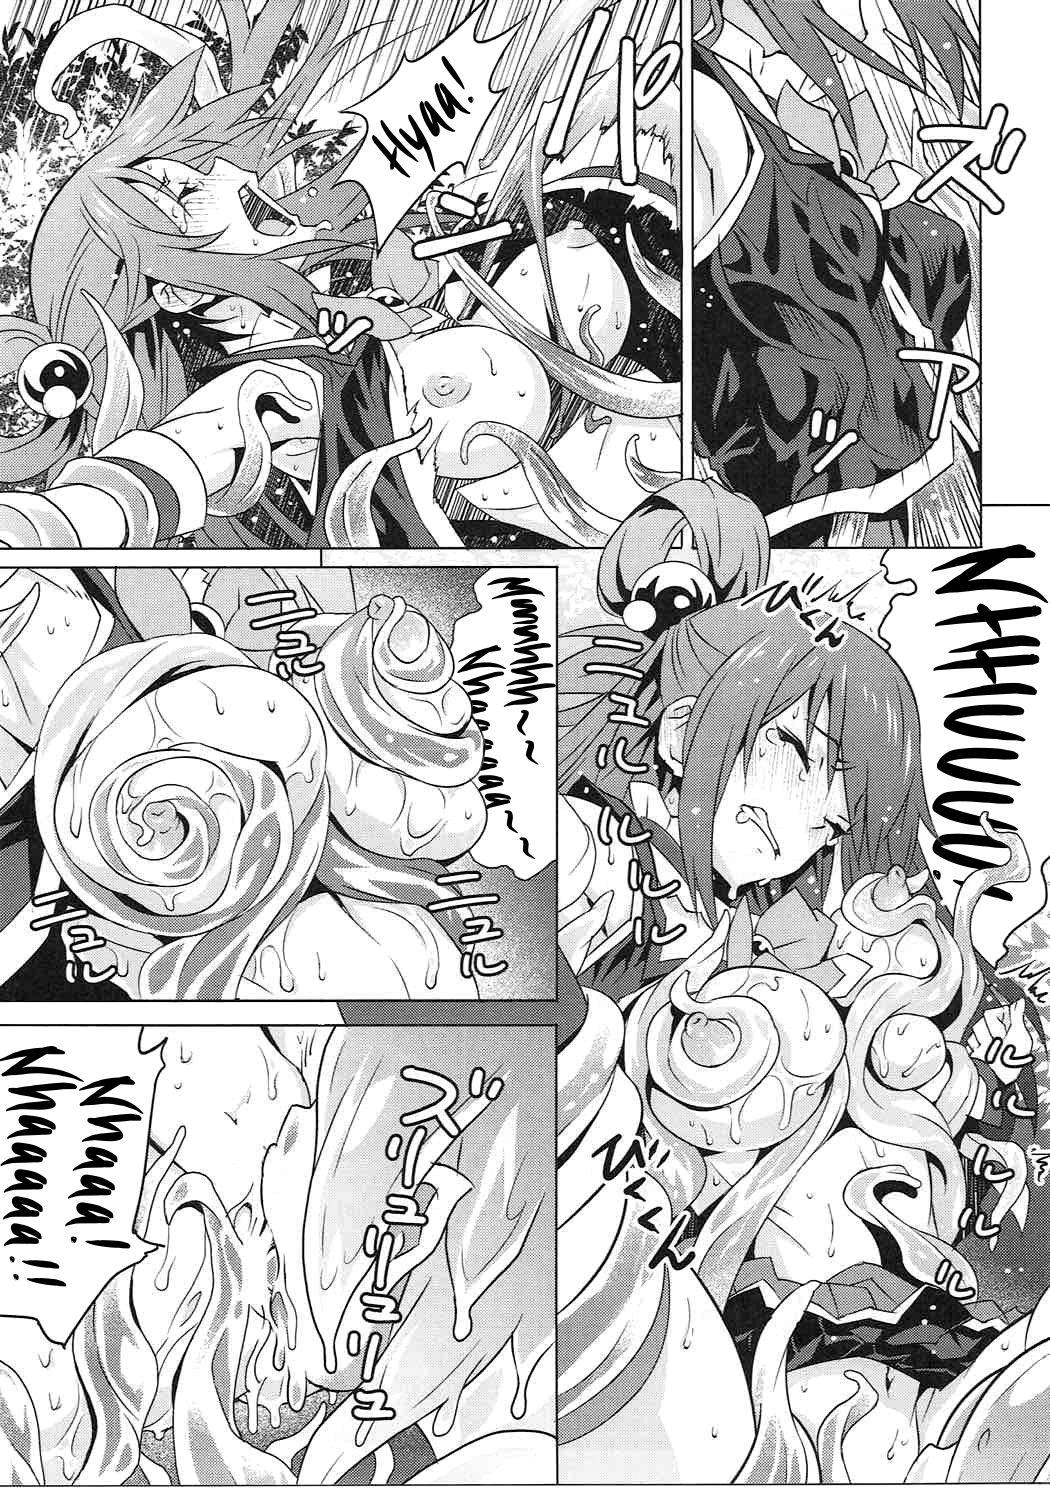 Kono Megami o Uneune Okasu Usui Hon | A thin book where this goddess gets ravished sinuously 9